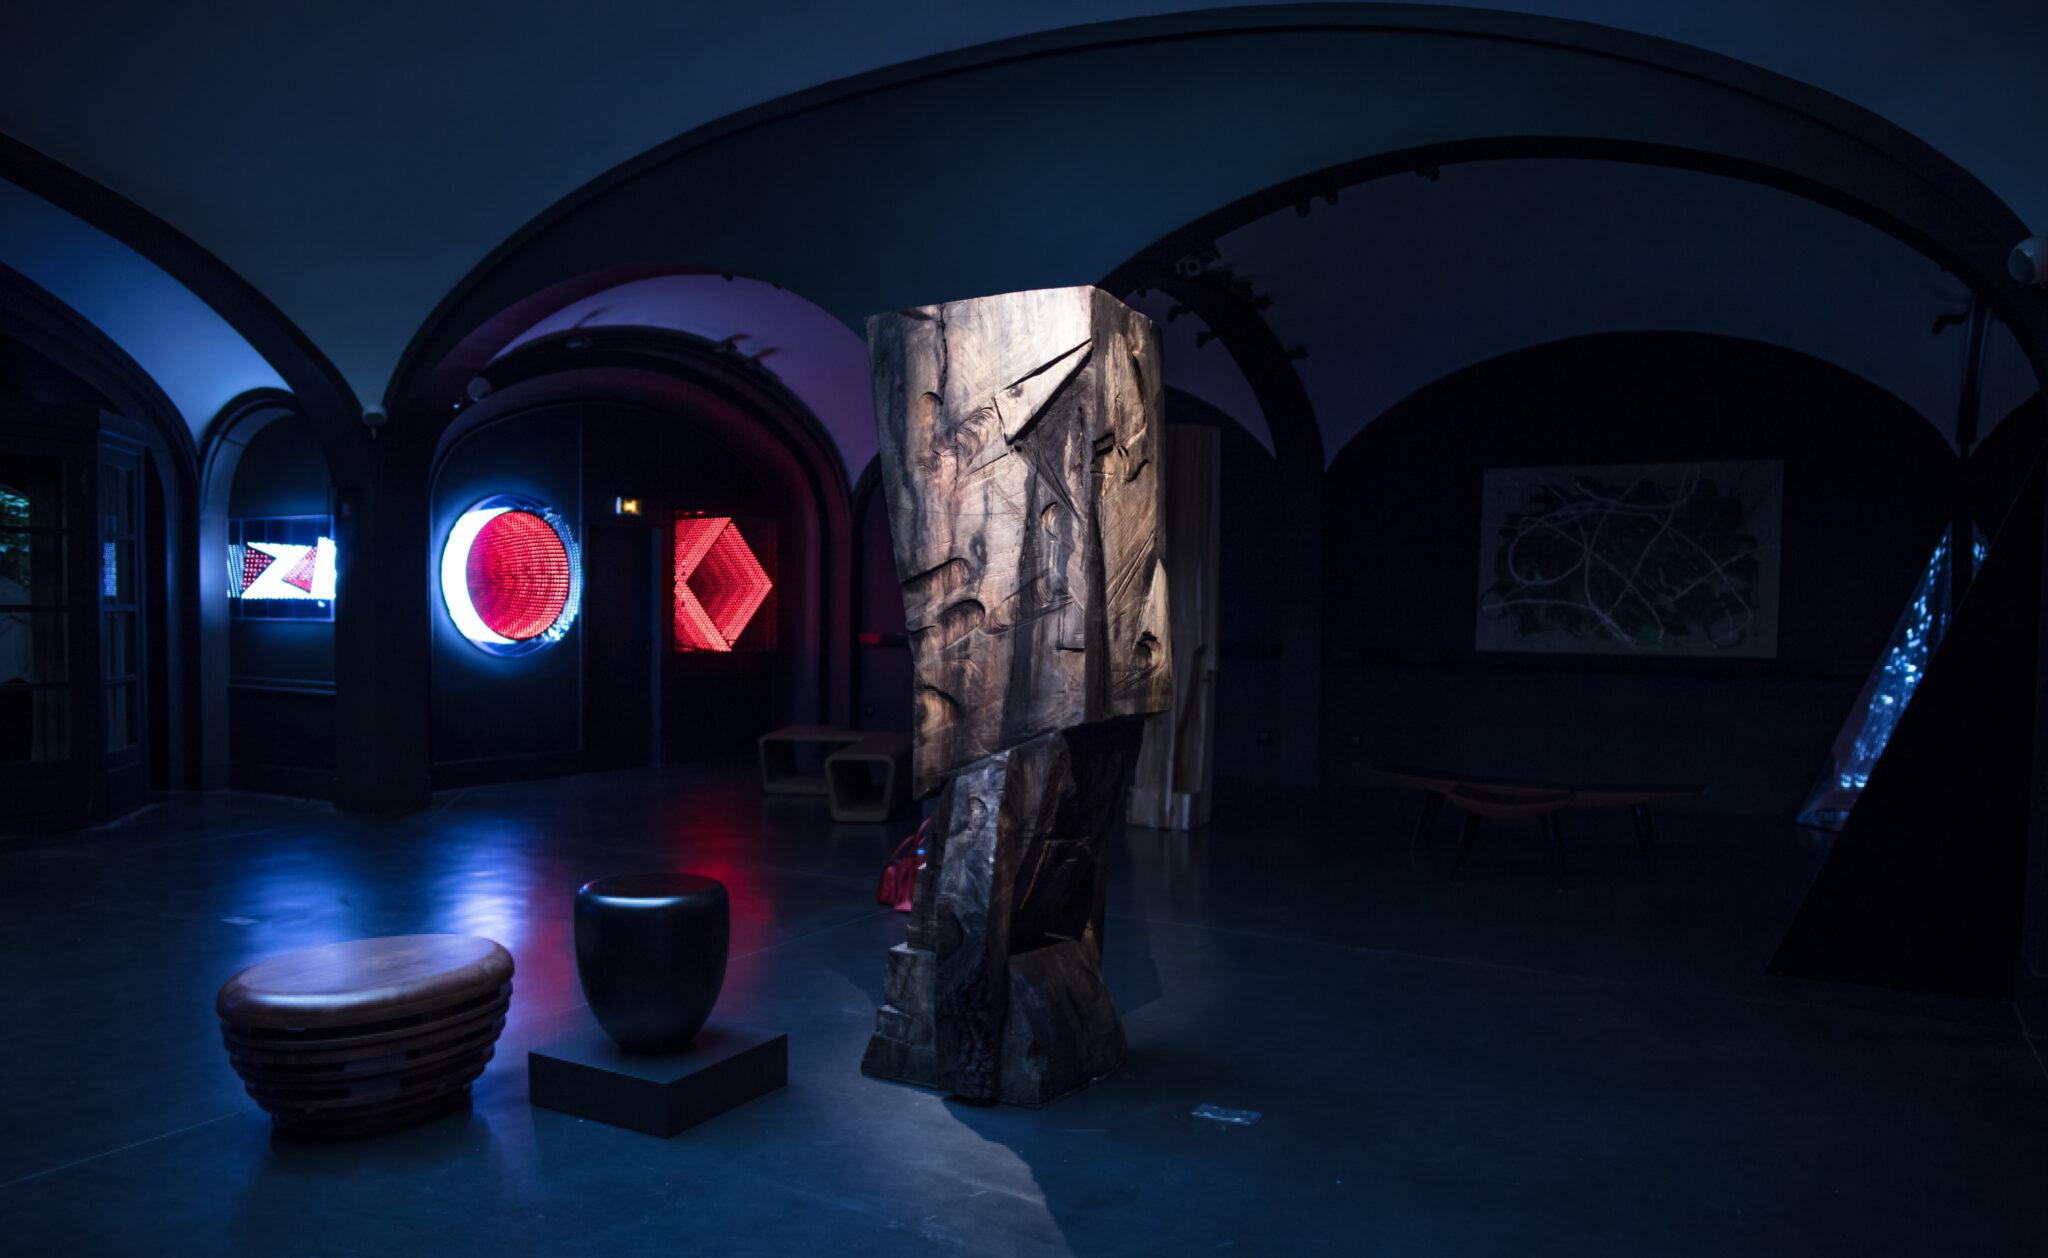 audrey-hatchikian-gallery-expo-momentum-sept-2018